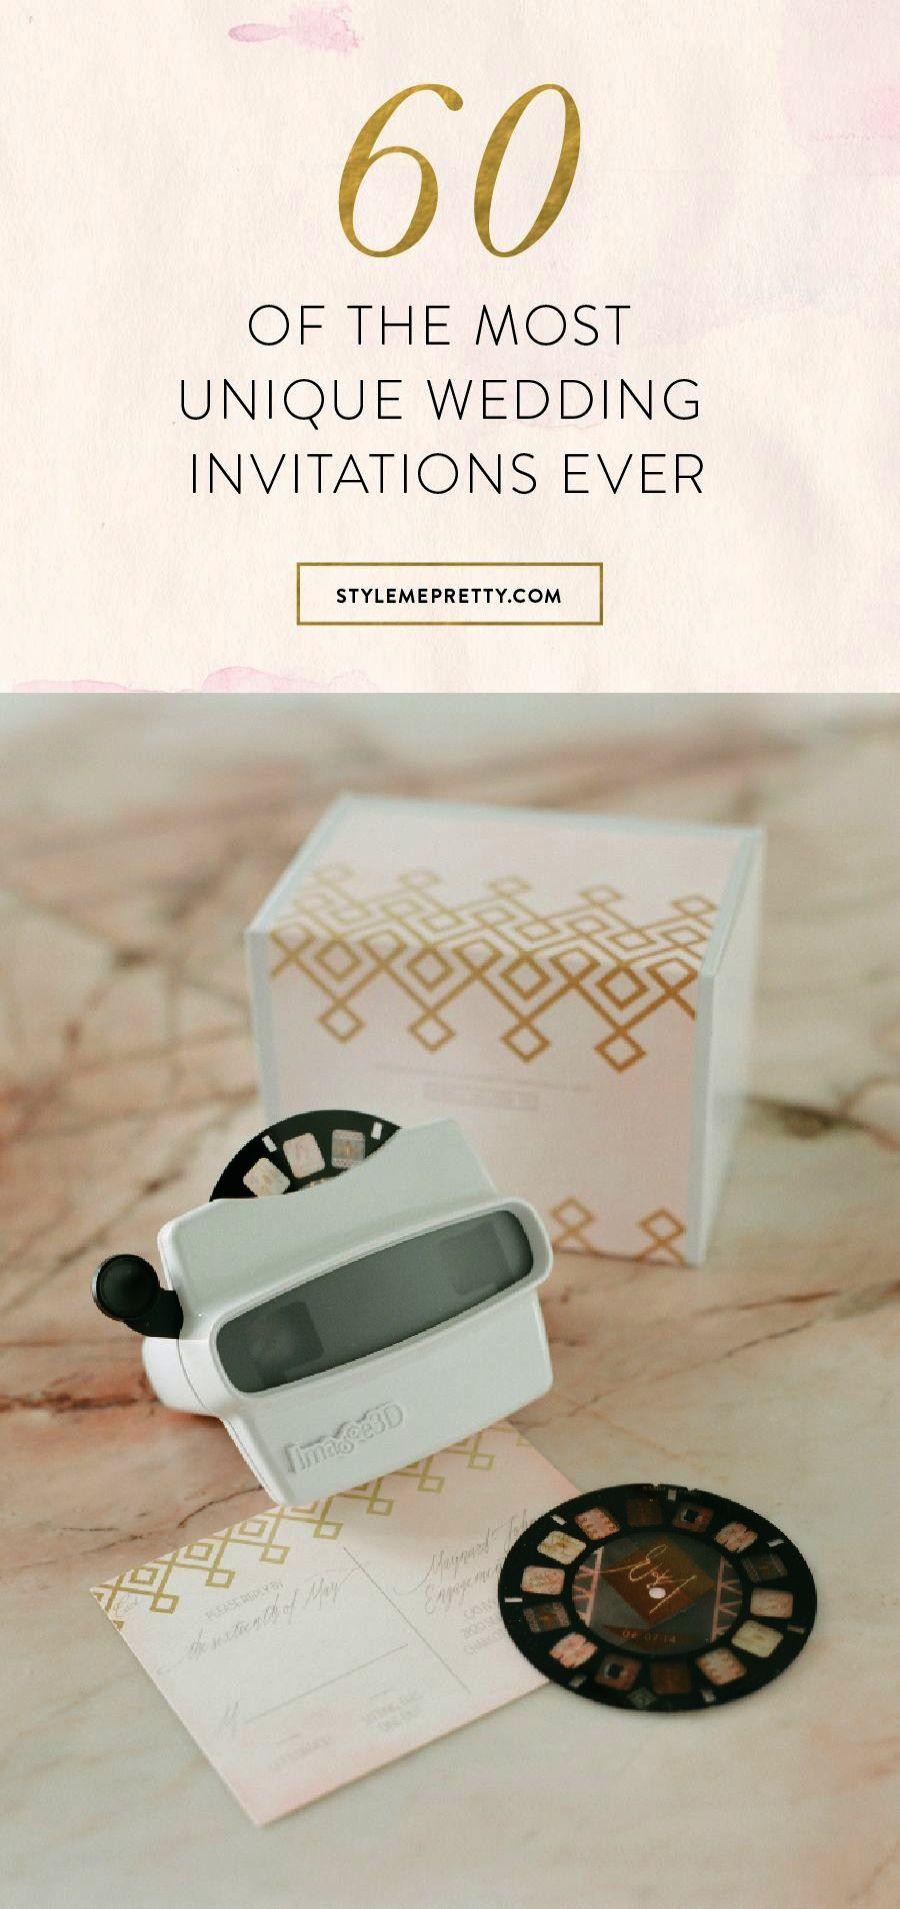 Diy wedding invitations ideas philippines wedding invitations